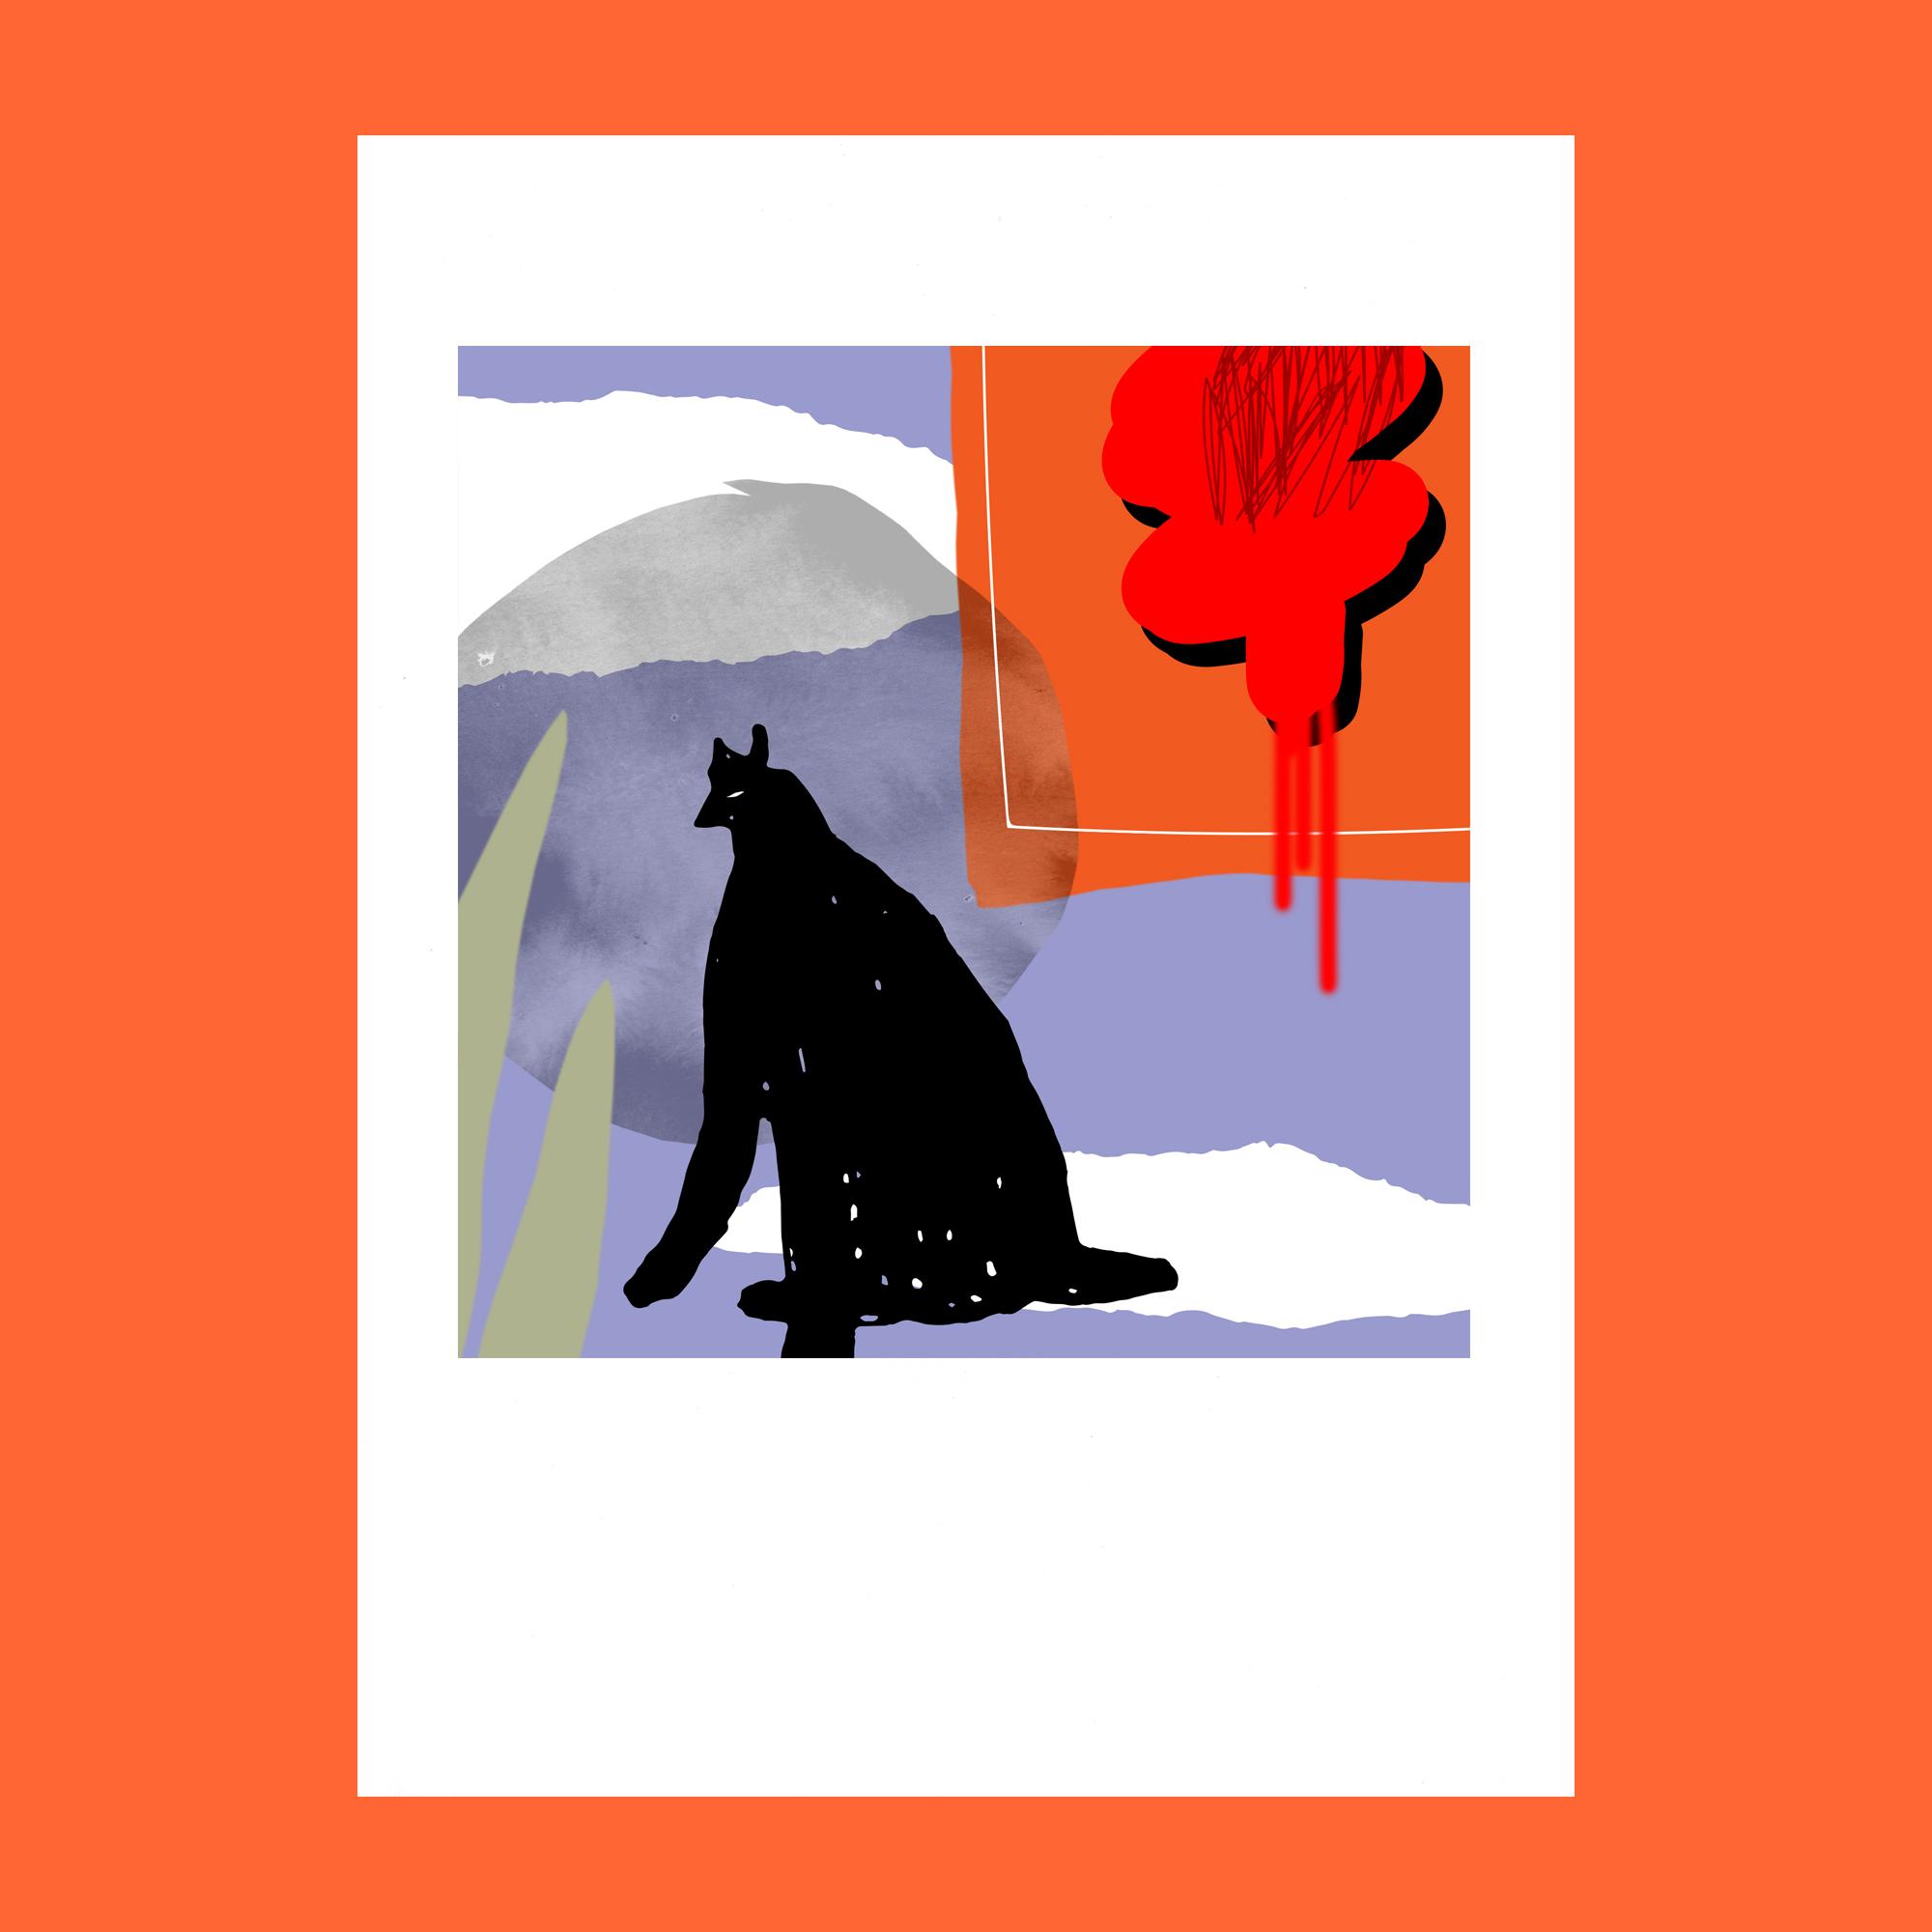 Grace Attlee, illustrator, painter, emerging artist, Margate, illustration, collage